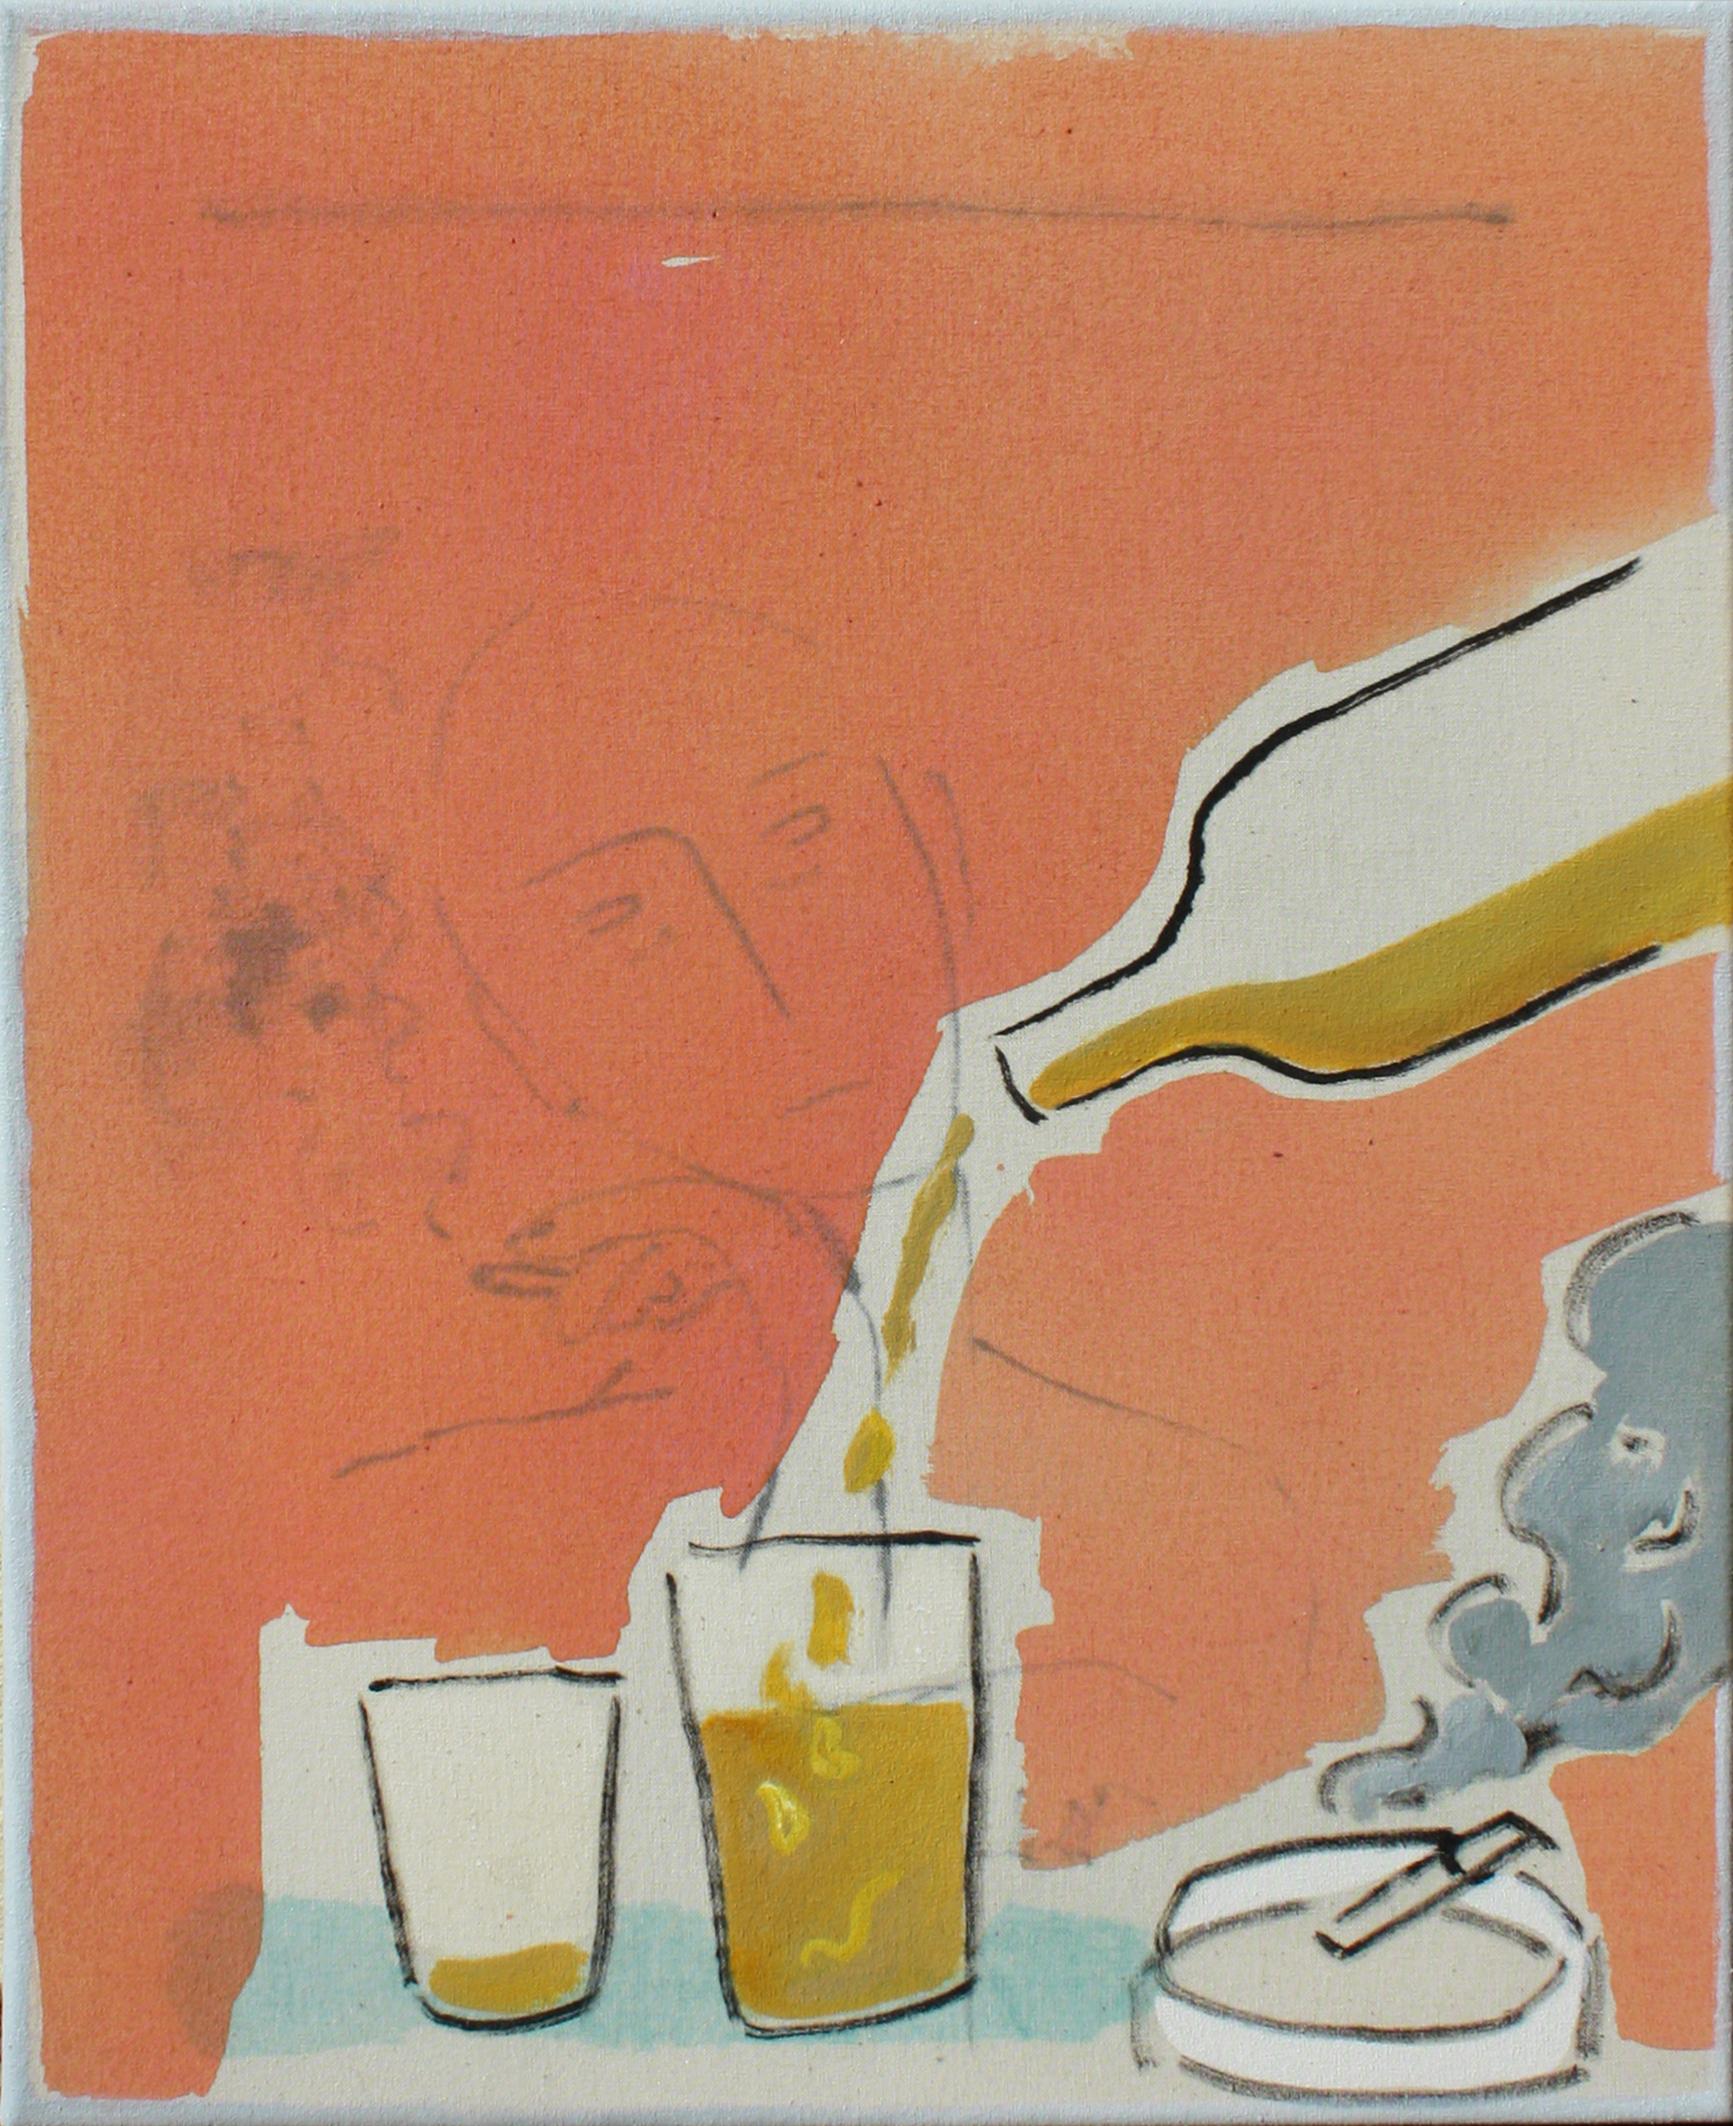 Blues VIII, oil and acrylics on canvas, 41 x 33 cm.